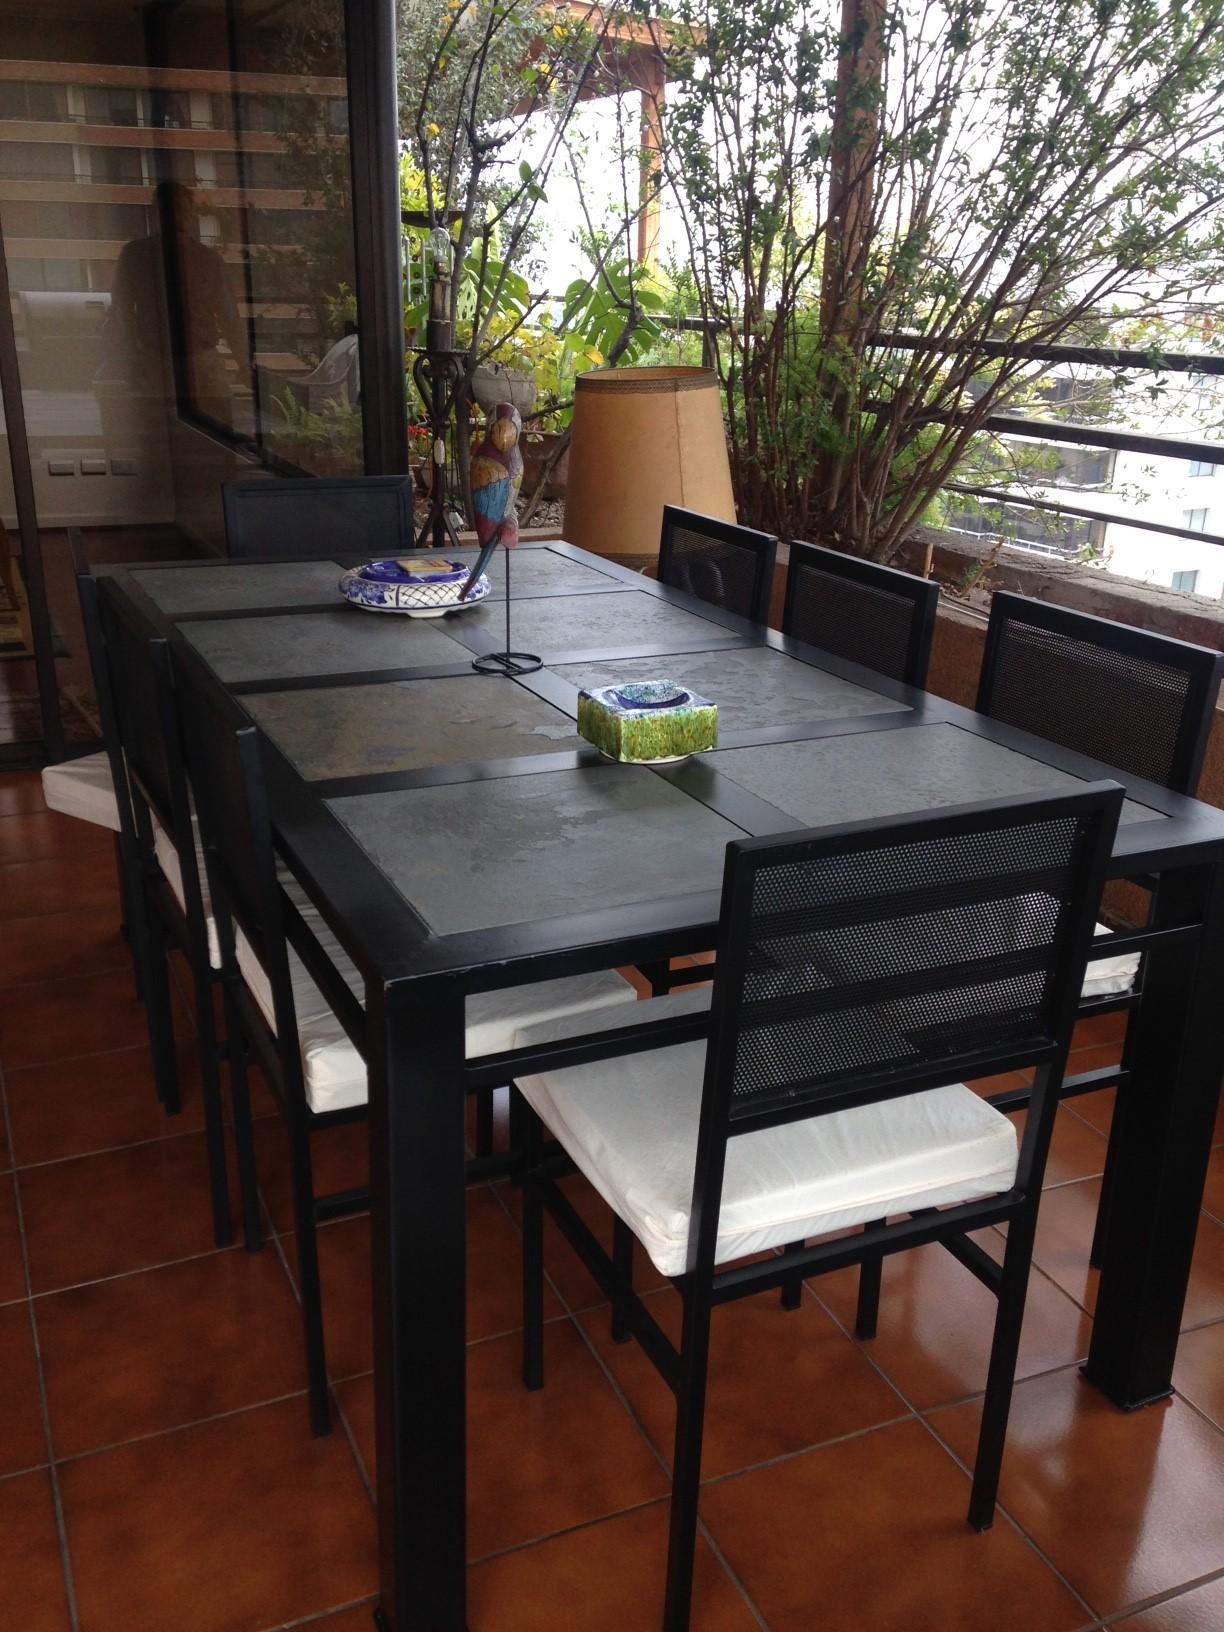 Comedor de fierro modelo puente alto 8 sillas rusti home for Comedores de terraza baratos